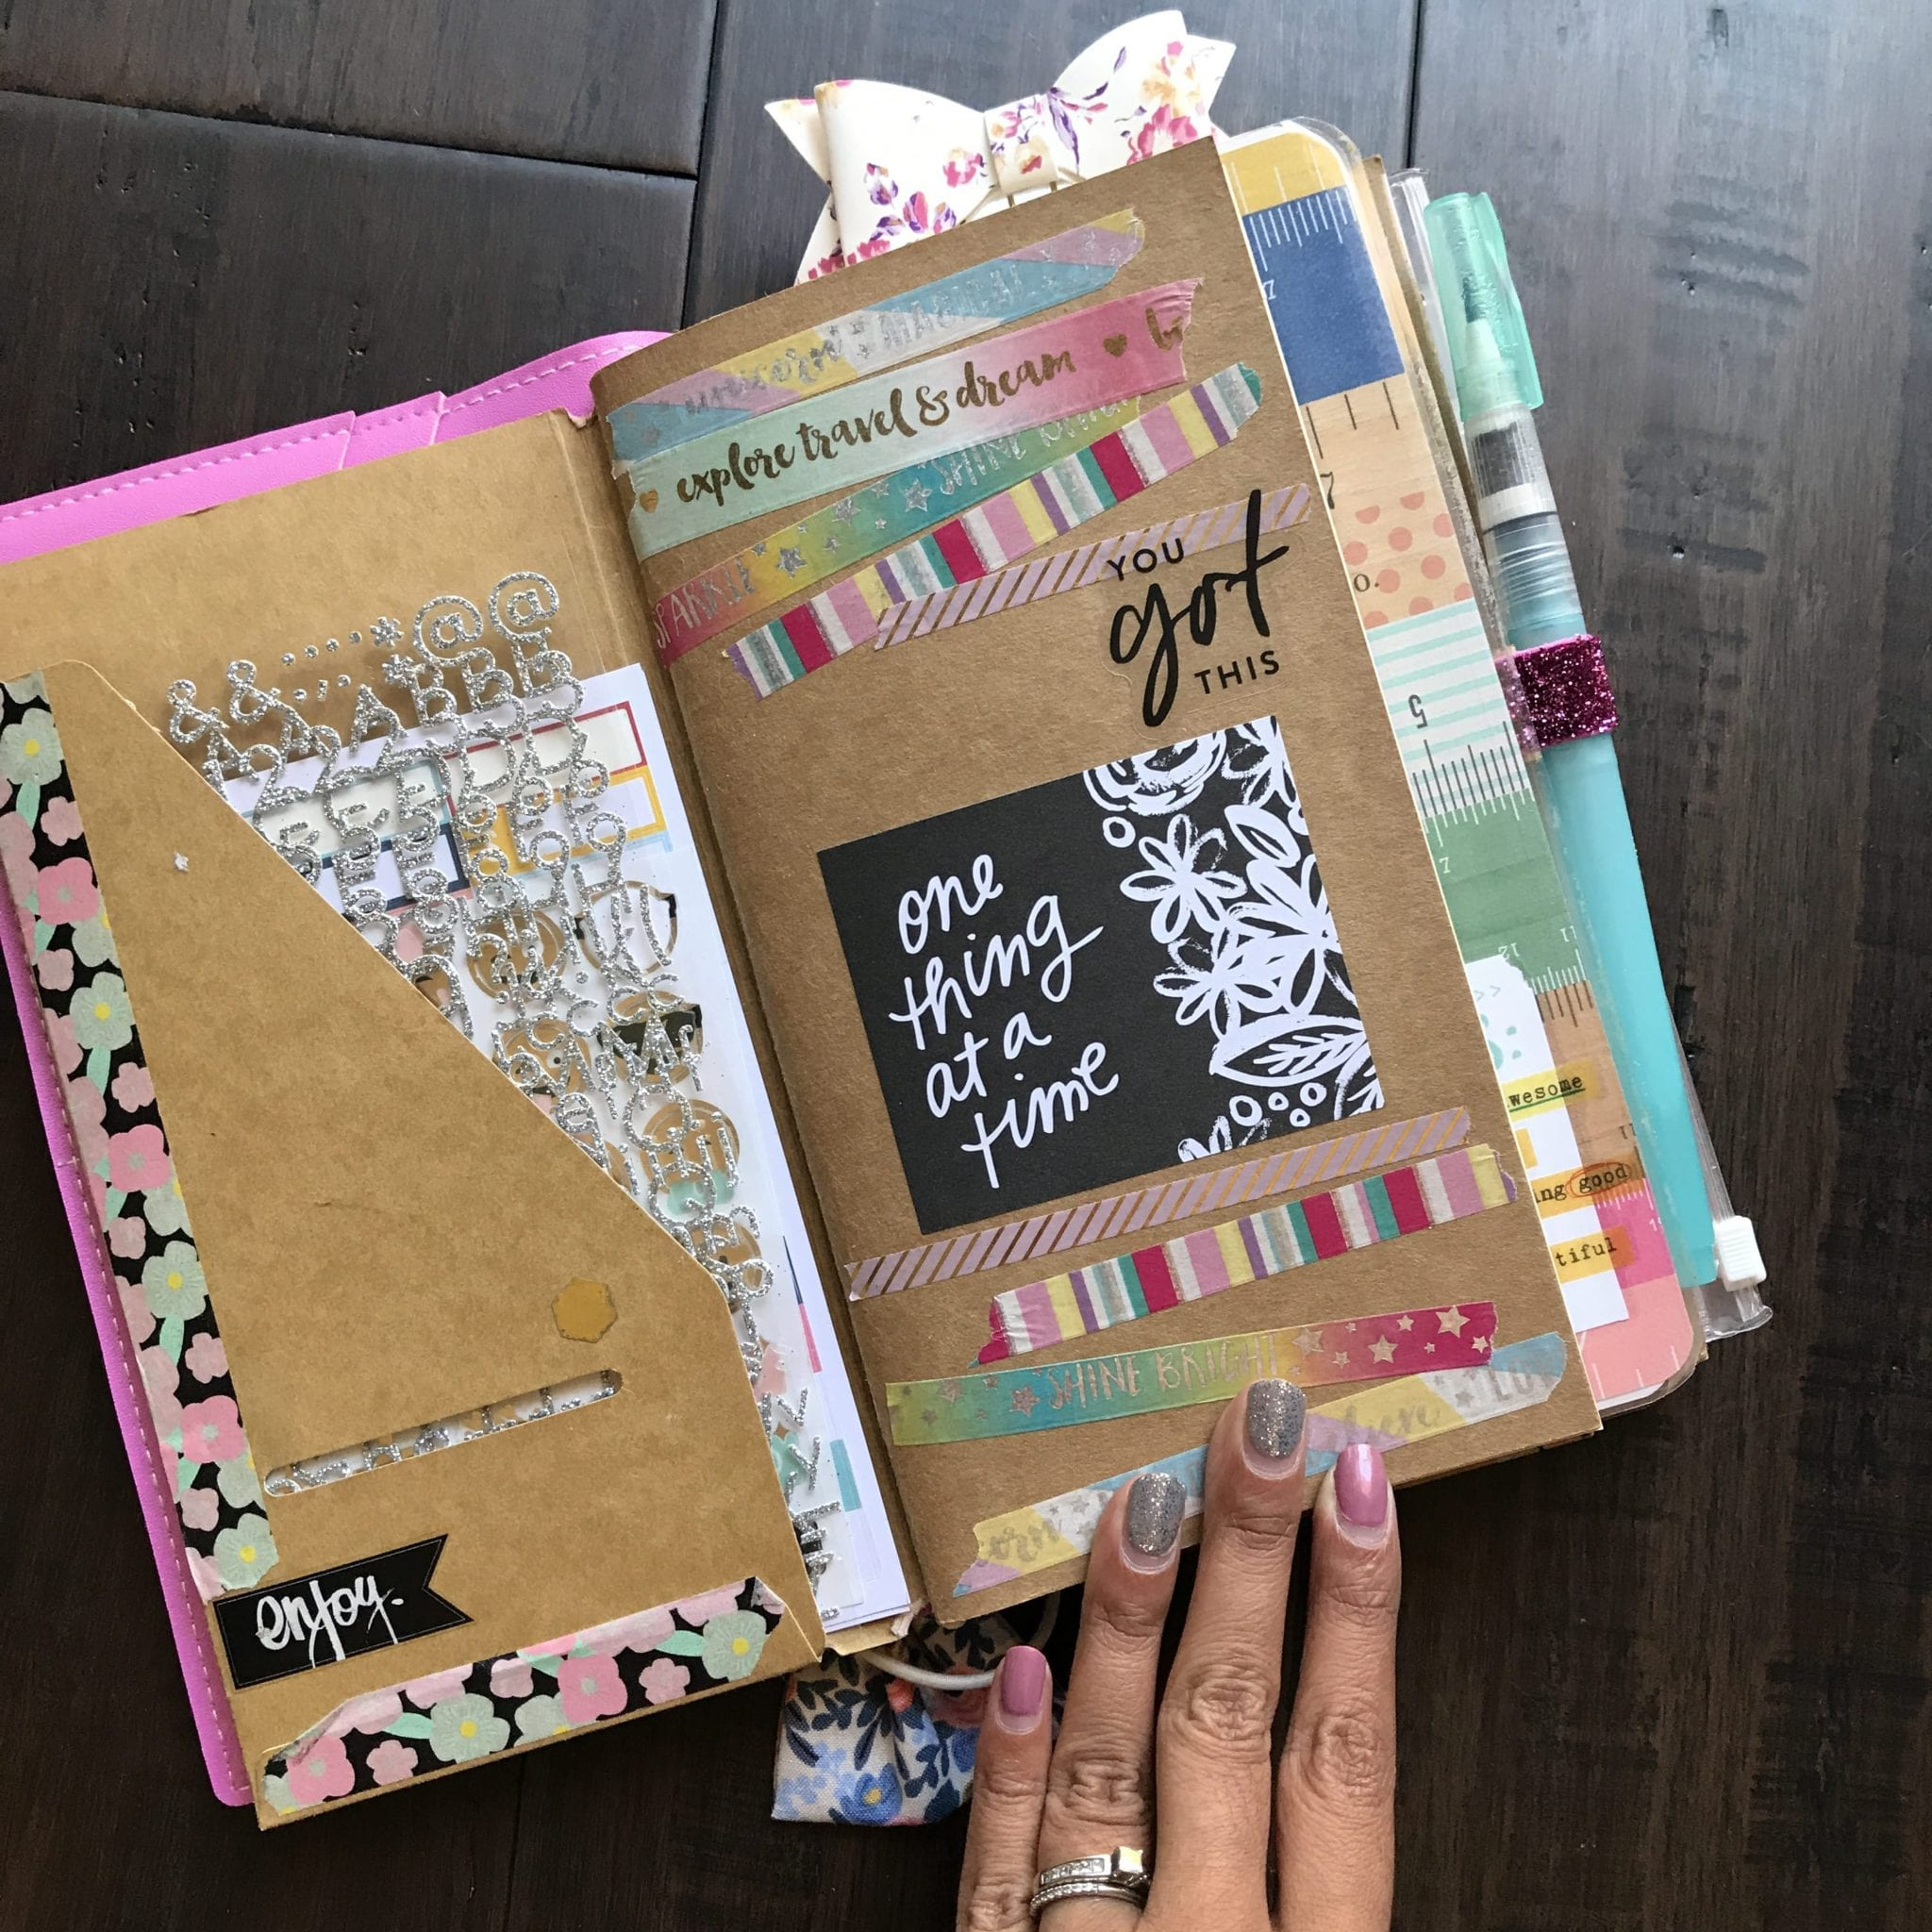 My Traveler's Notebook Journaling Setup